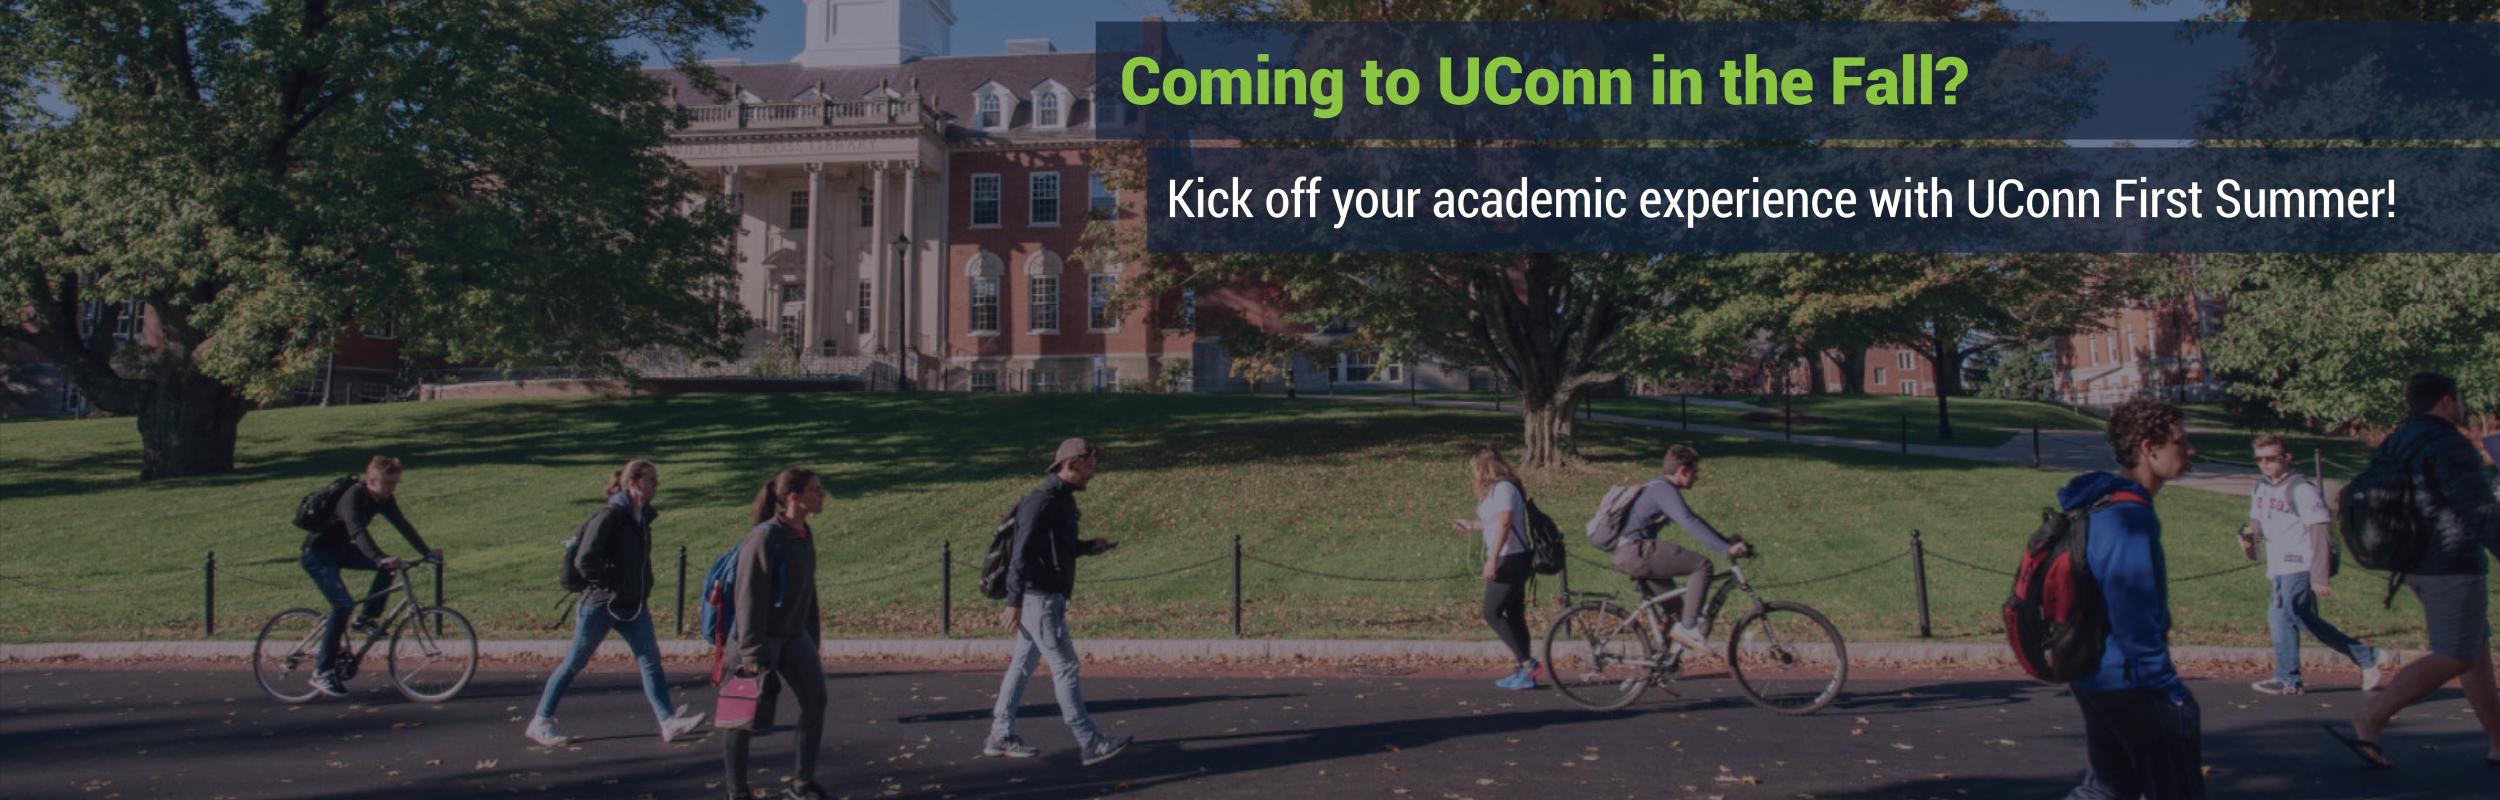 UConn First Summer: Ad